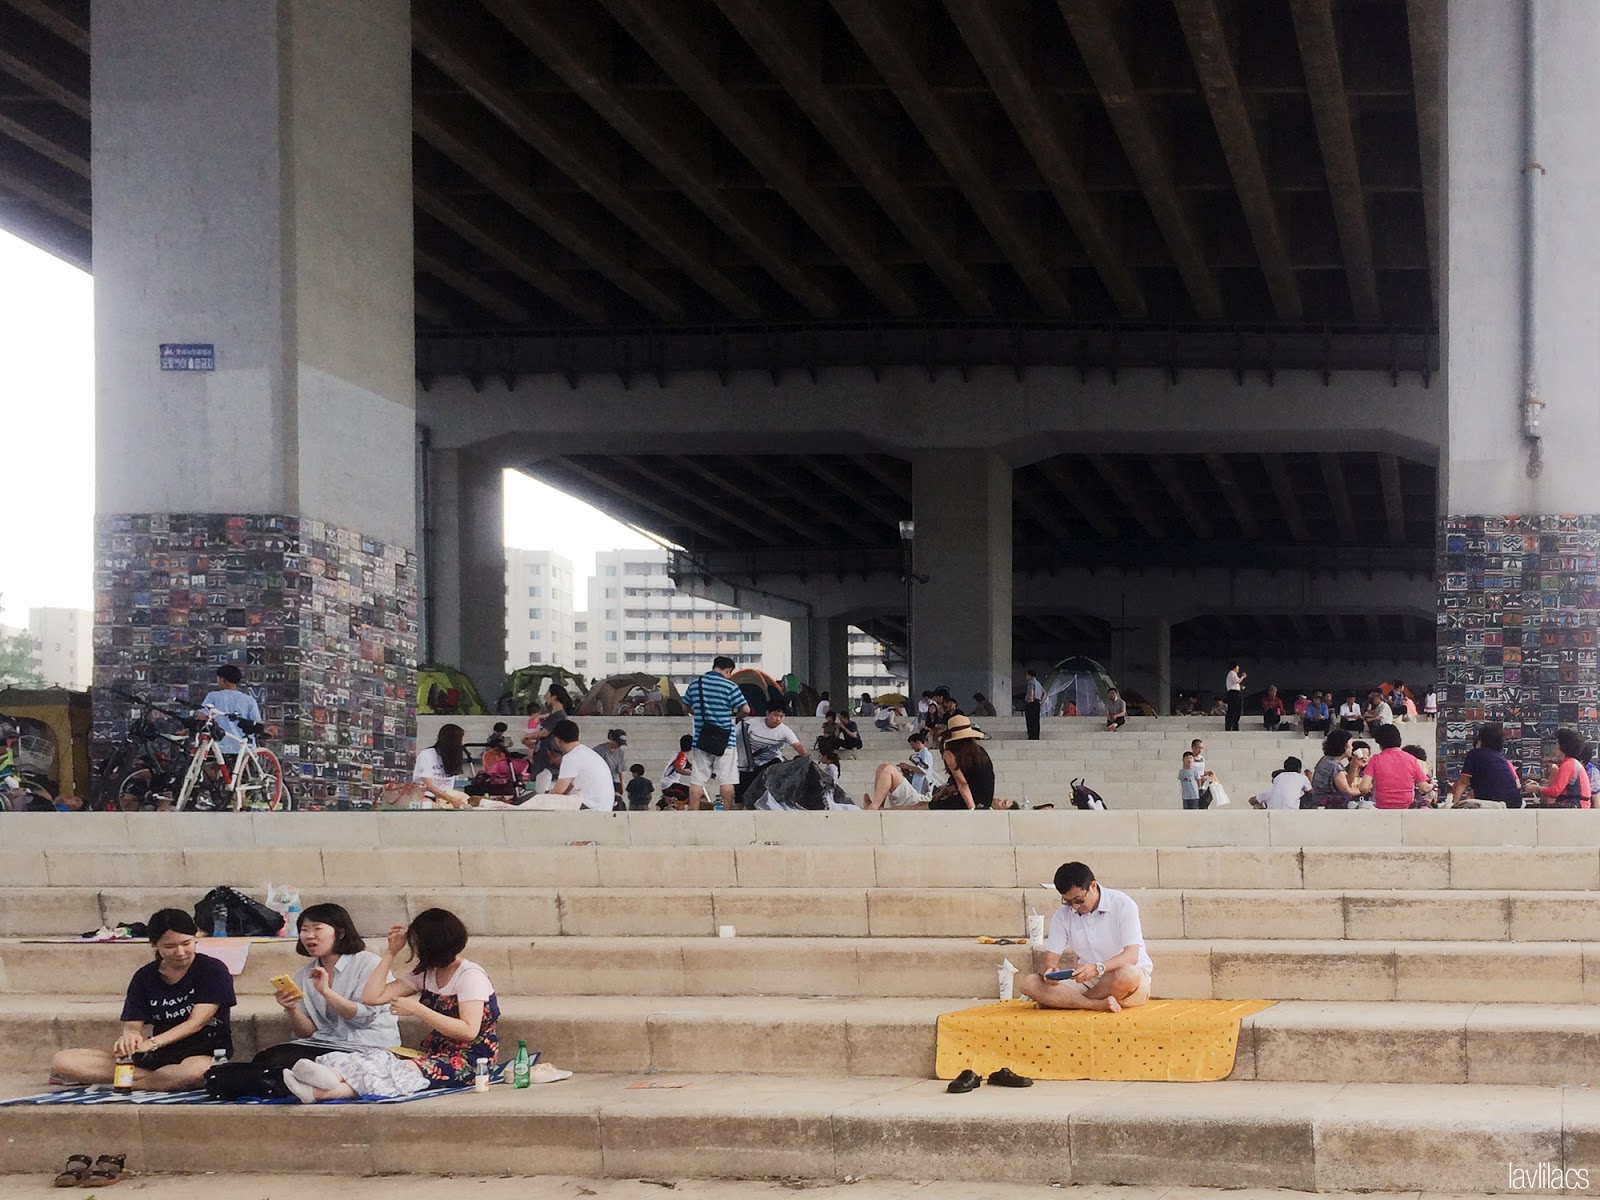 Seoul, Korea - Summer Study Abroad 2014 - Yeouido Park - Han River - picnicking